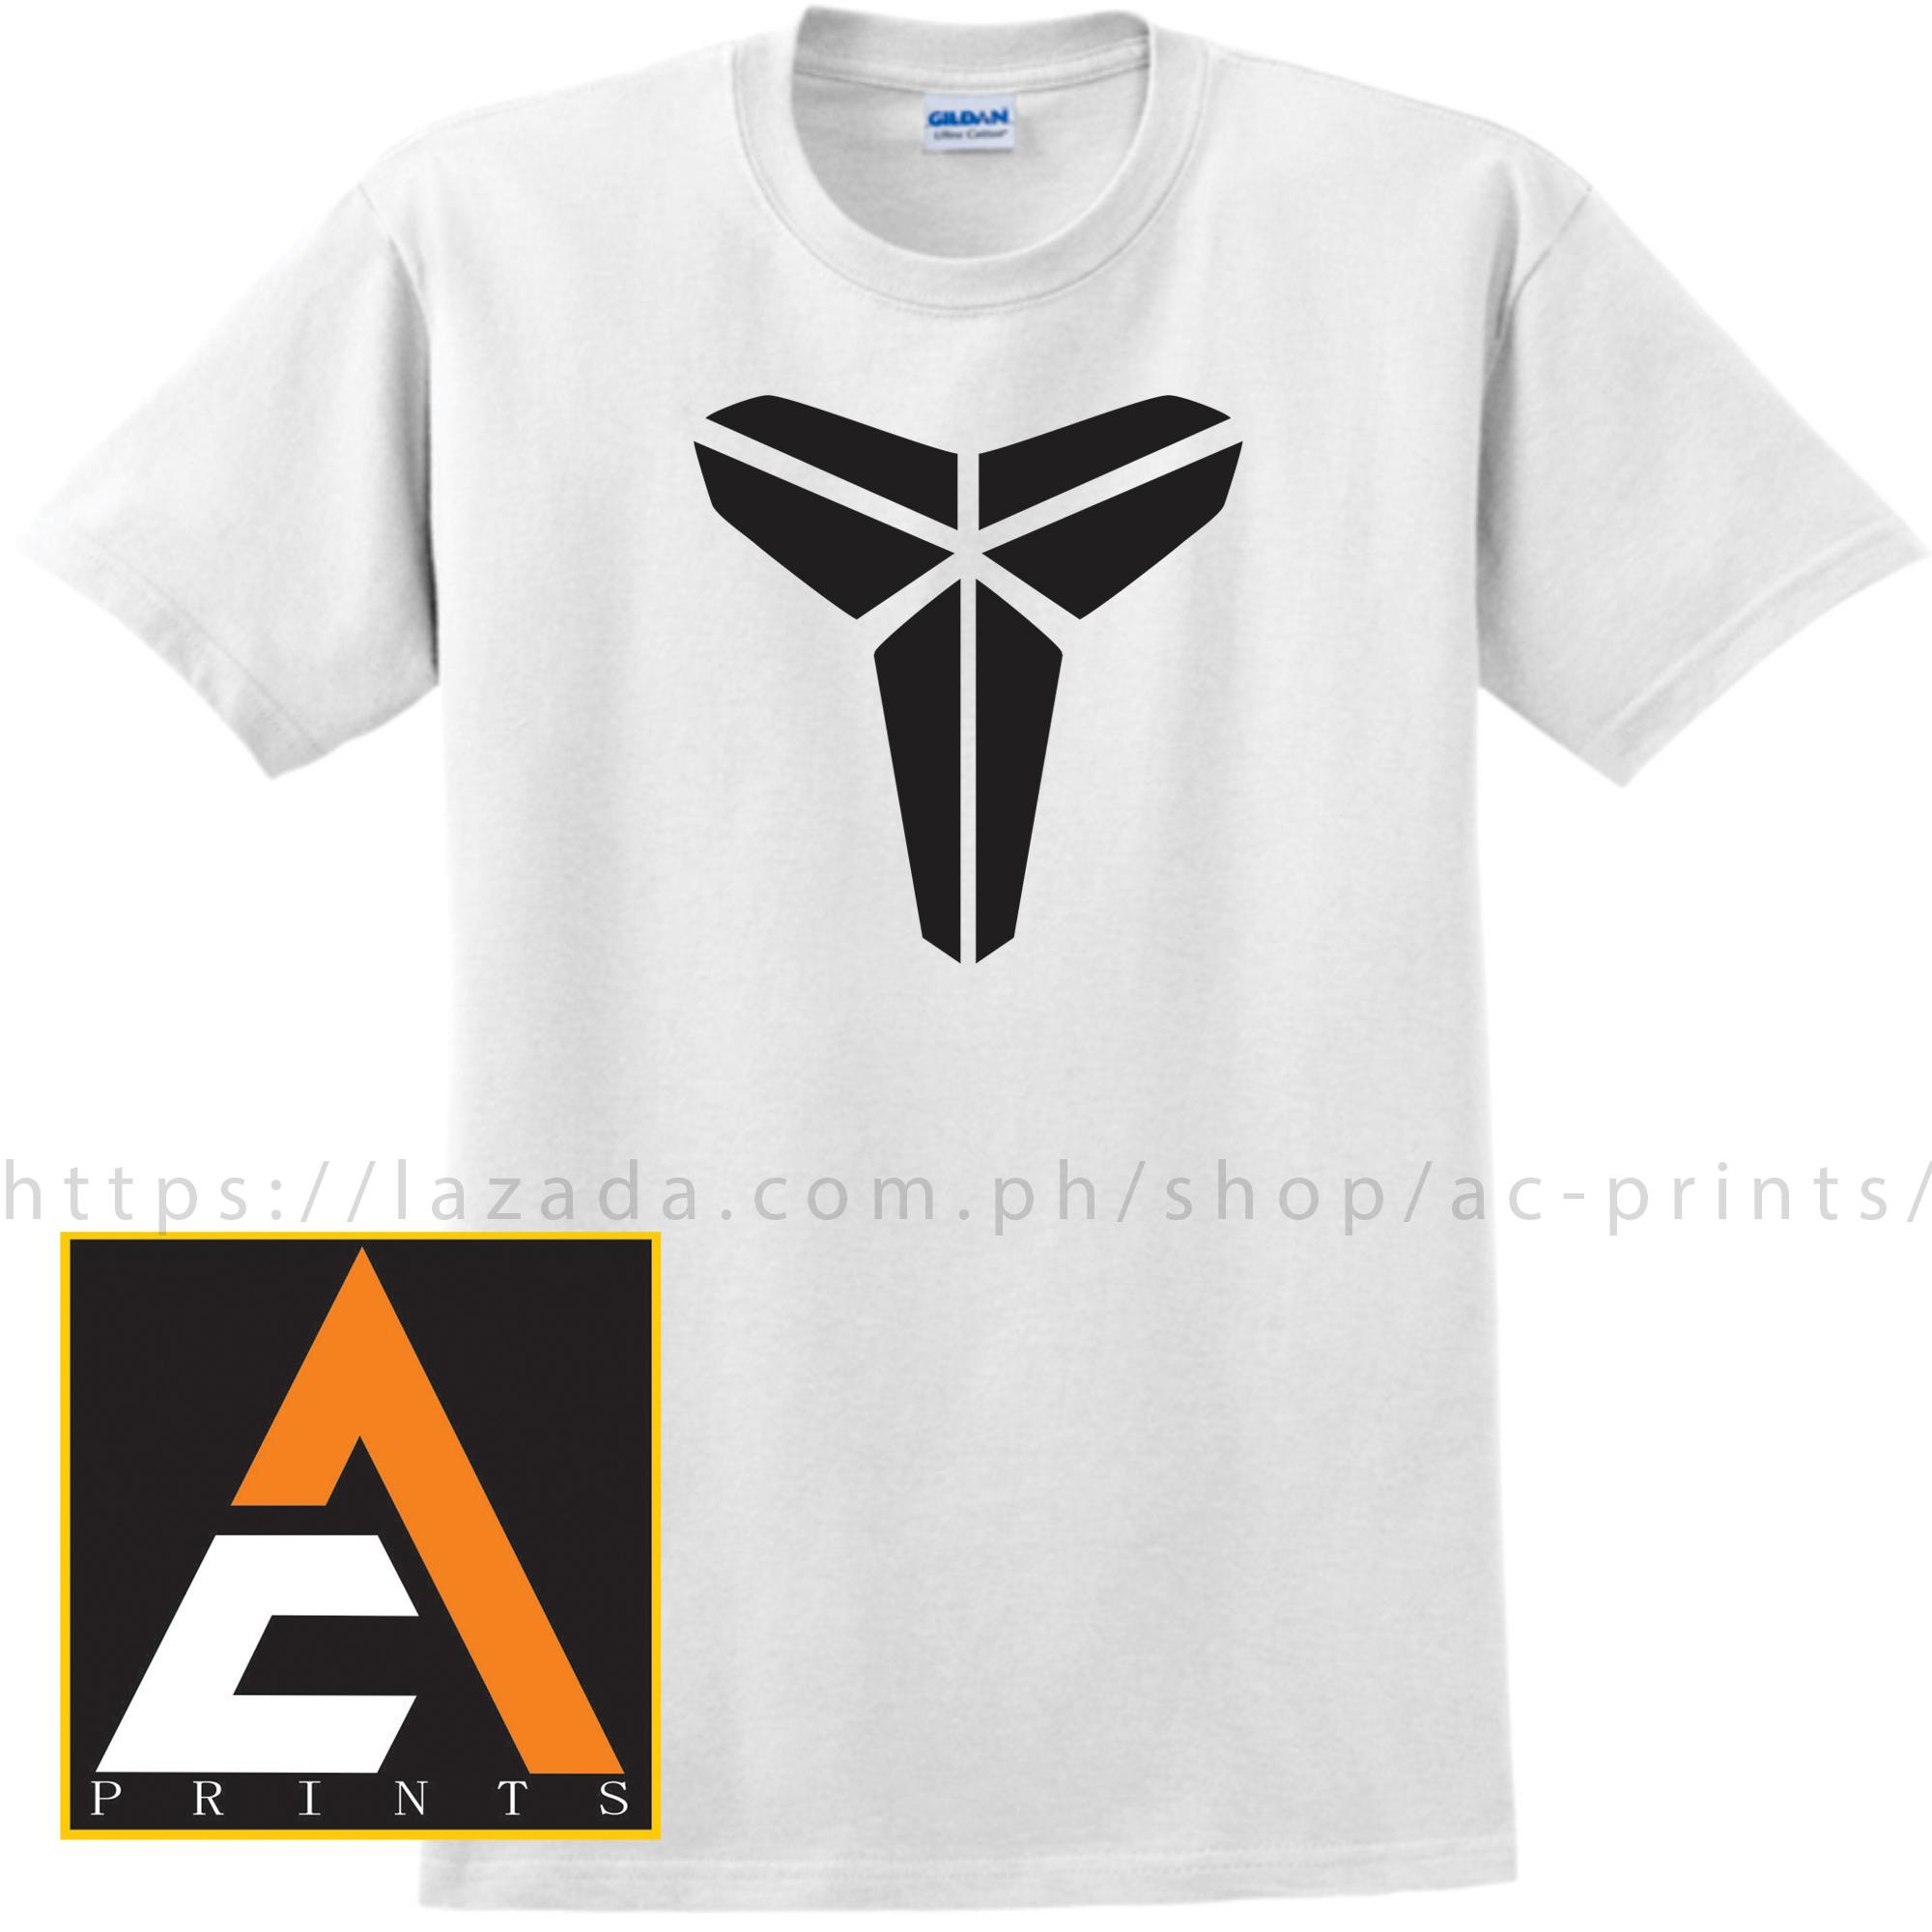 big sale 24b5e 2874f Kobe Bryant shirt Basketball tshirt Basketball shirt Unisex  KOBE02(Men/Women)(Male/Female)(Gildan) T-shirts Tees T shirts Tshirts ...